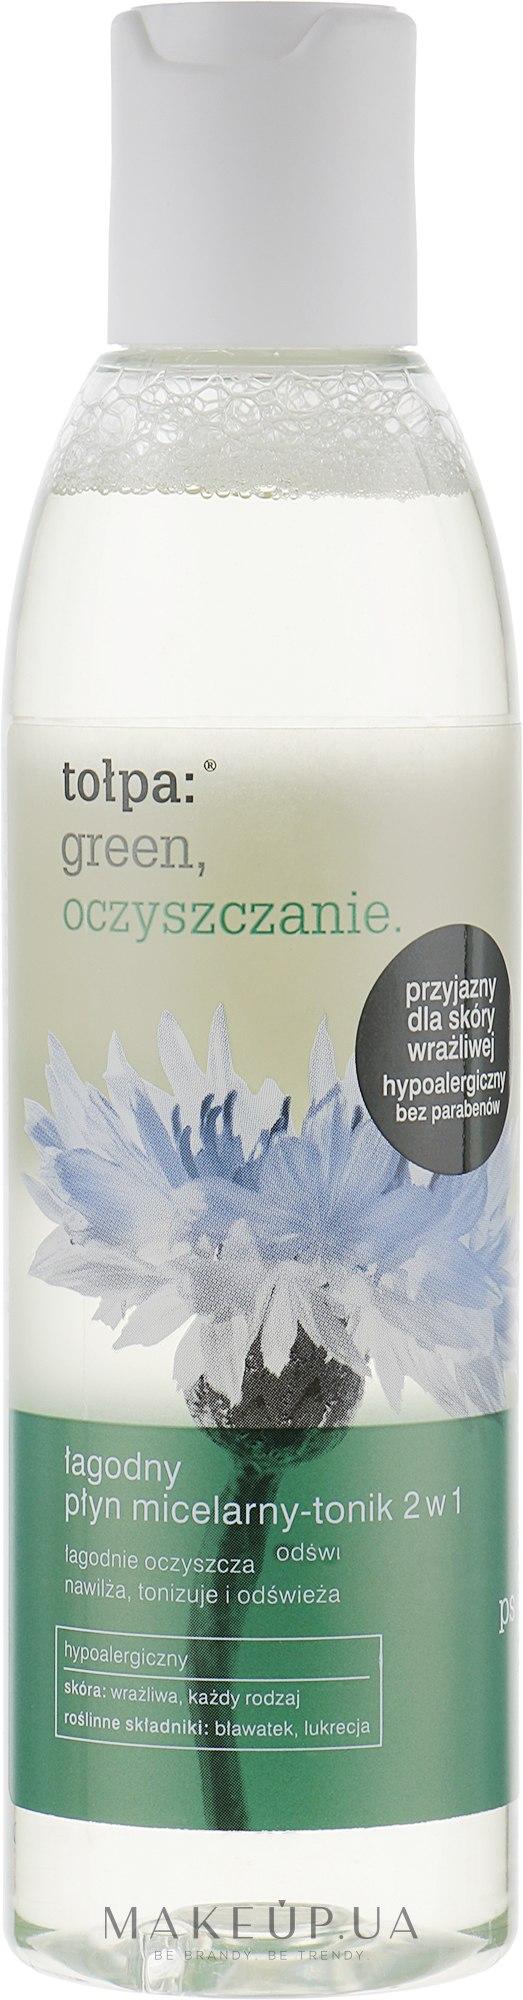 Мицеллярный тоник для лица - Tolpa Green Cleanup Mils Micellar Toner 2in1 — фото 200ml